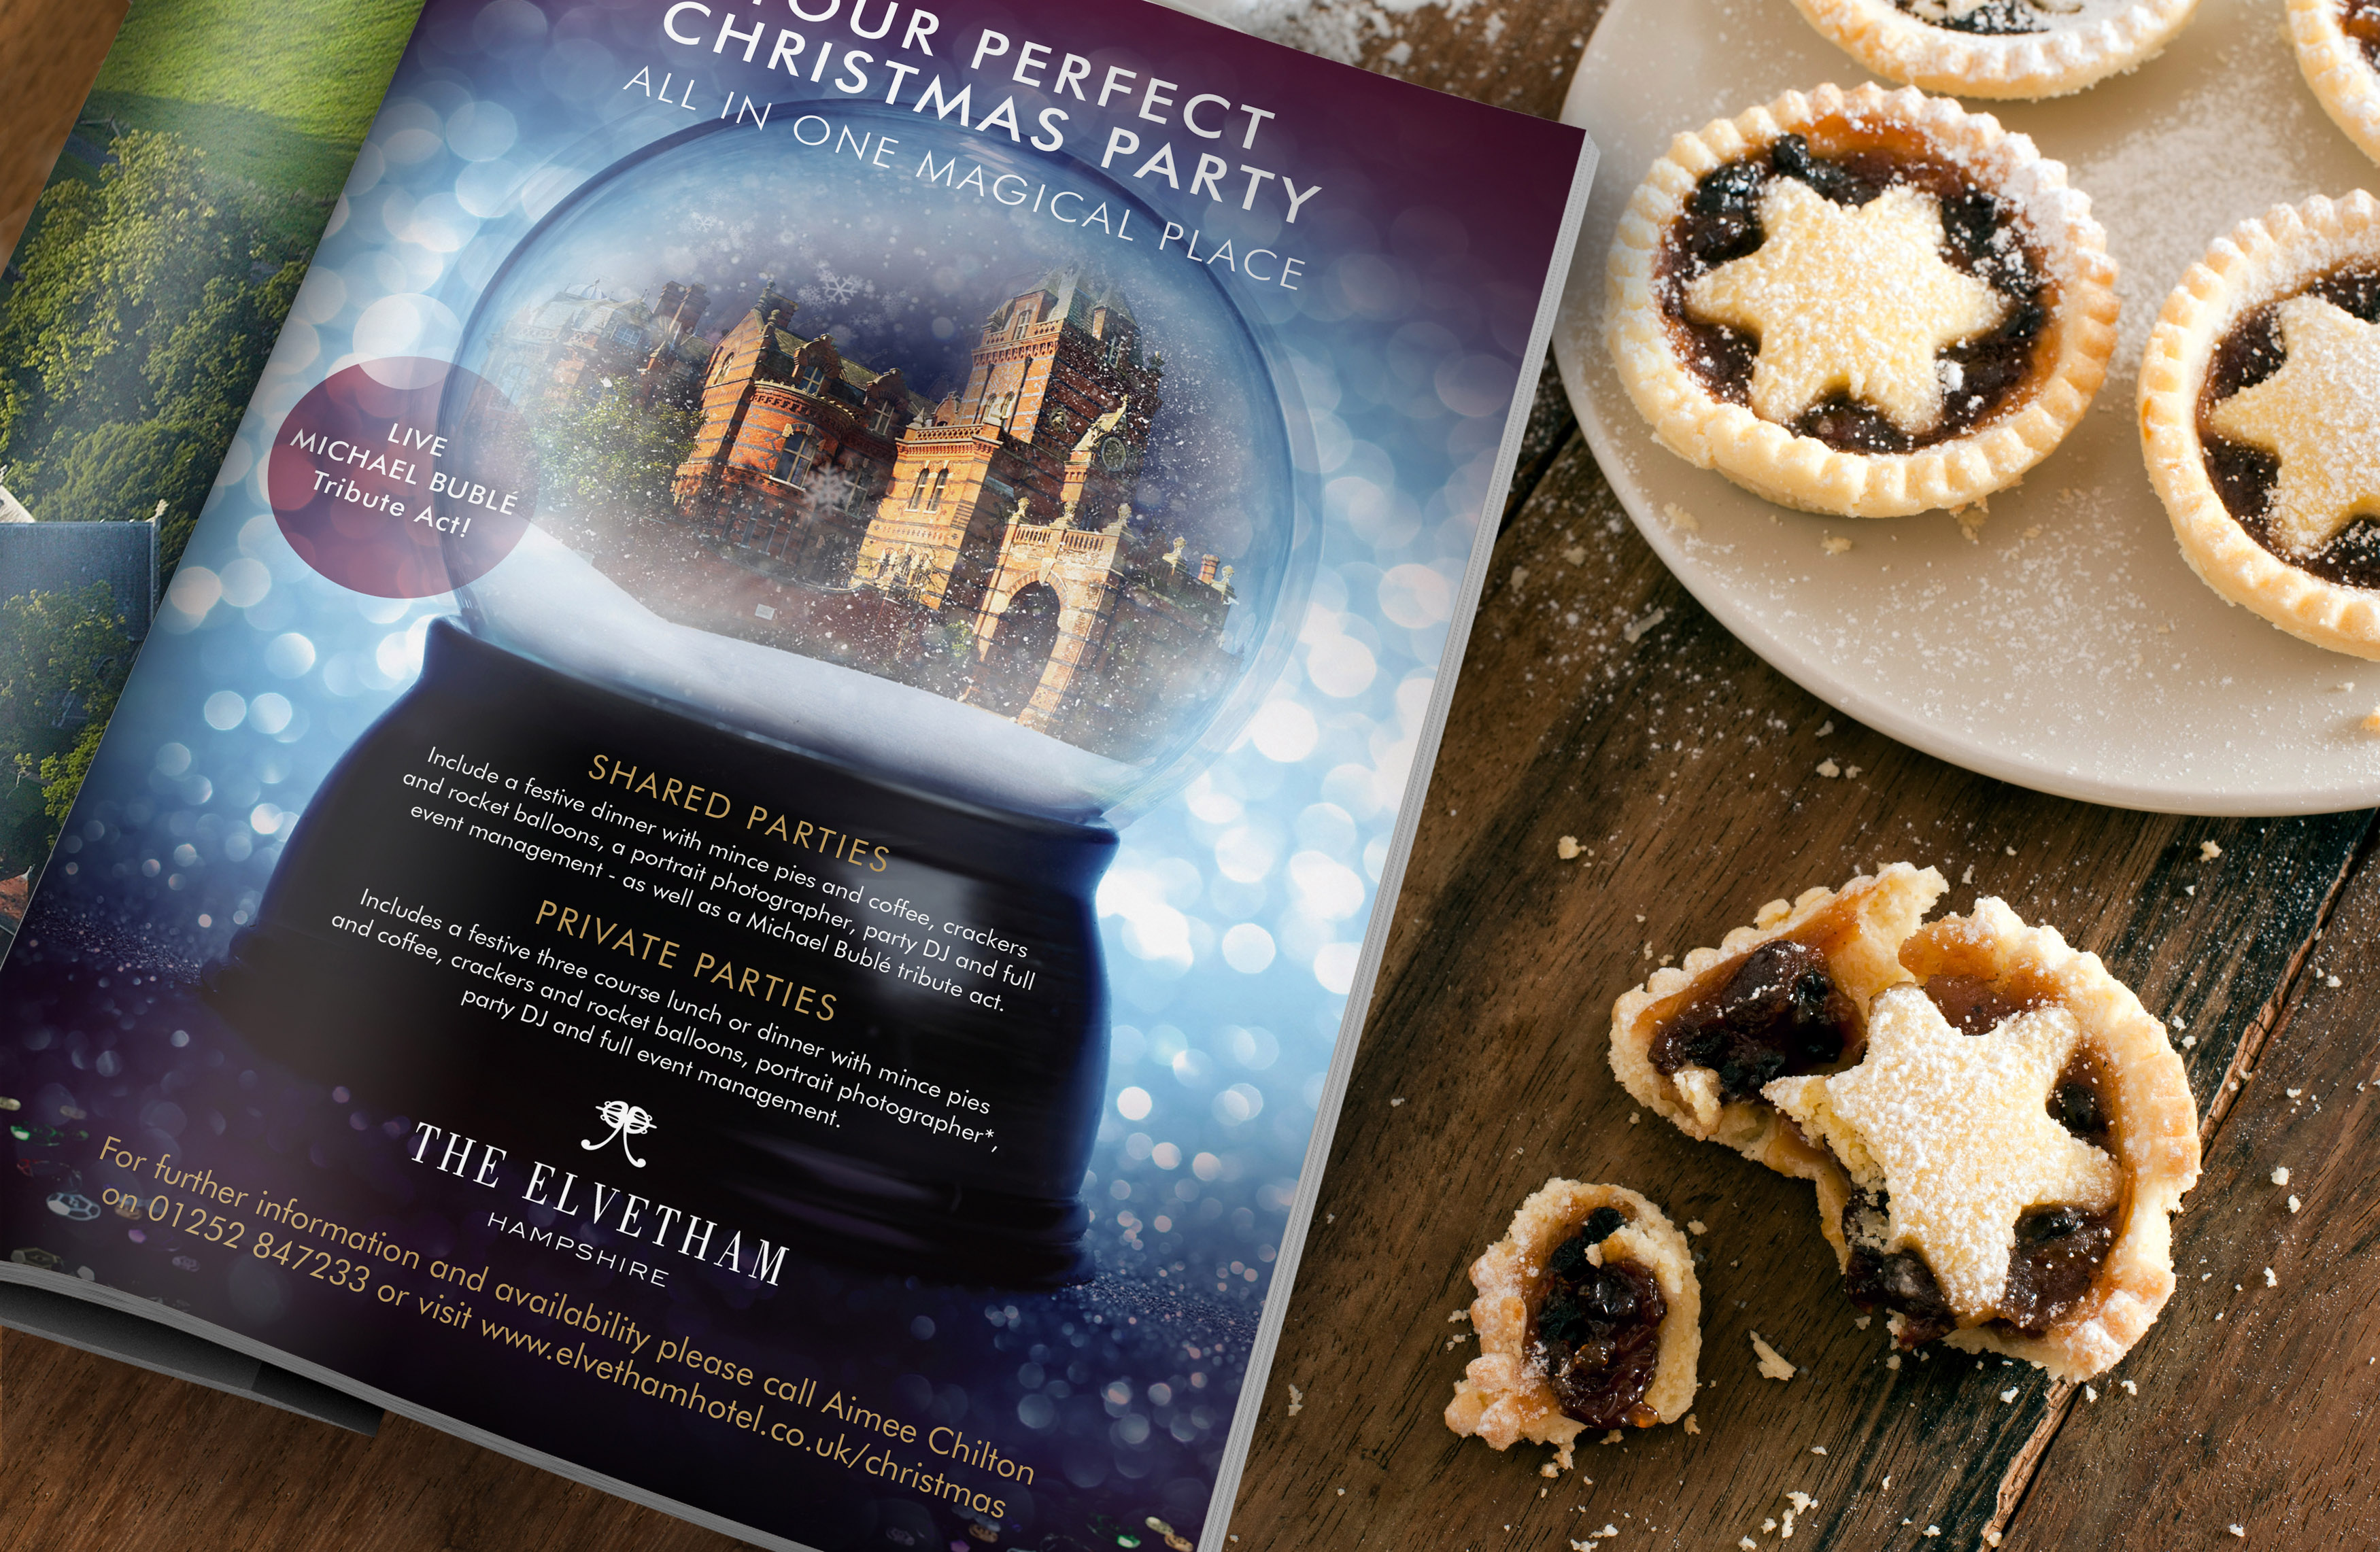 The Elvetham's Seasonal Promotion flyer